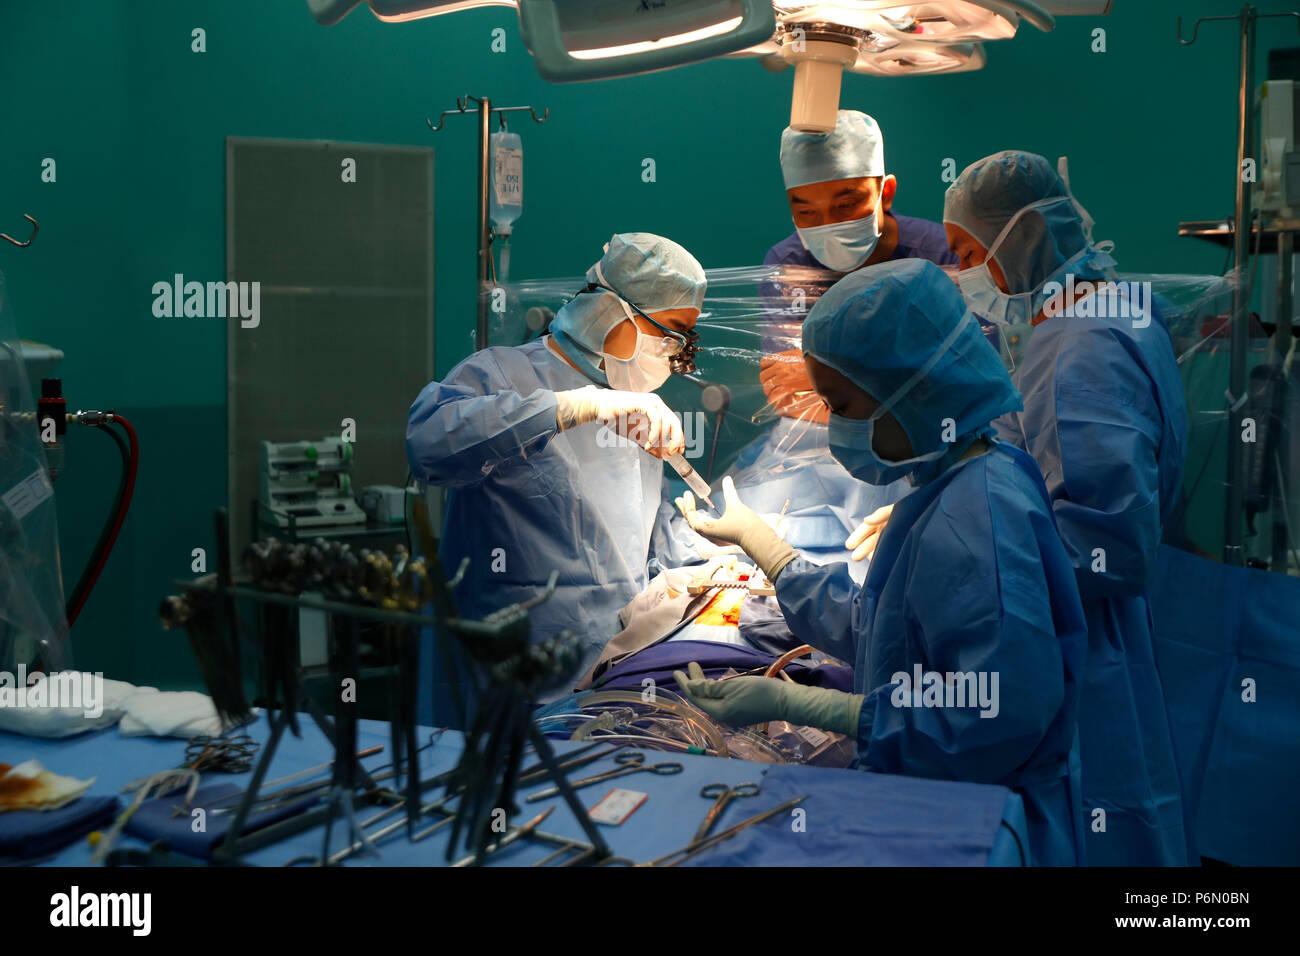 Tam Duc Cardiology Hospital Operating Theater Cardiac Surgery Ho Chi Minh City Vietnam Stock Photo Alamy